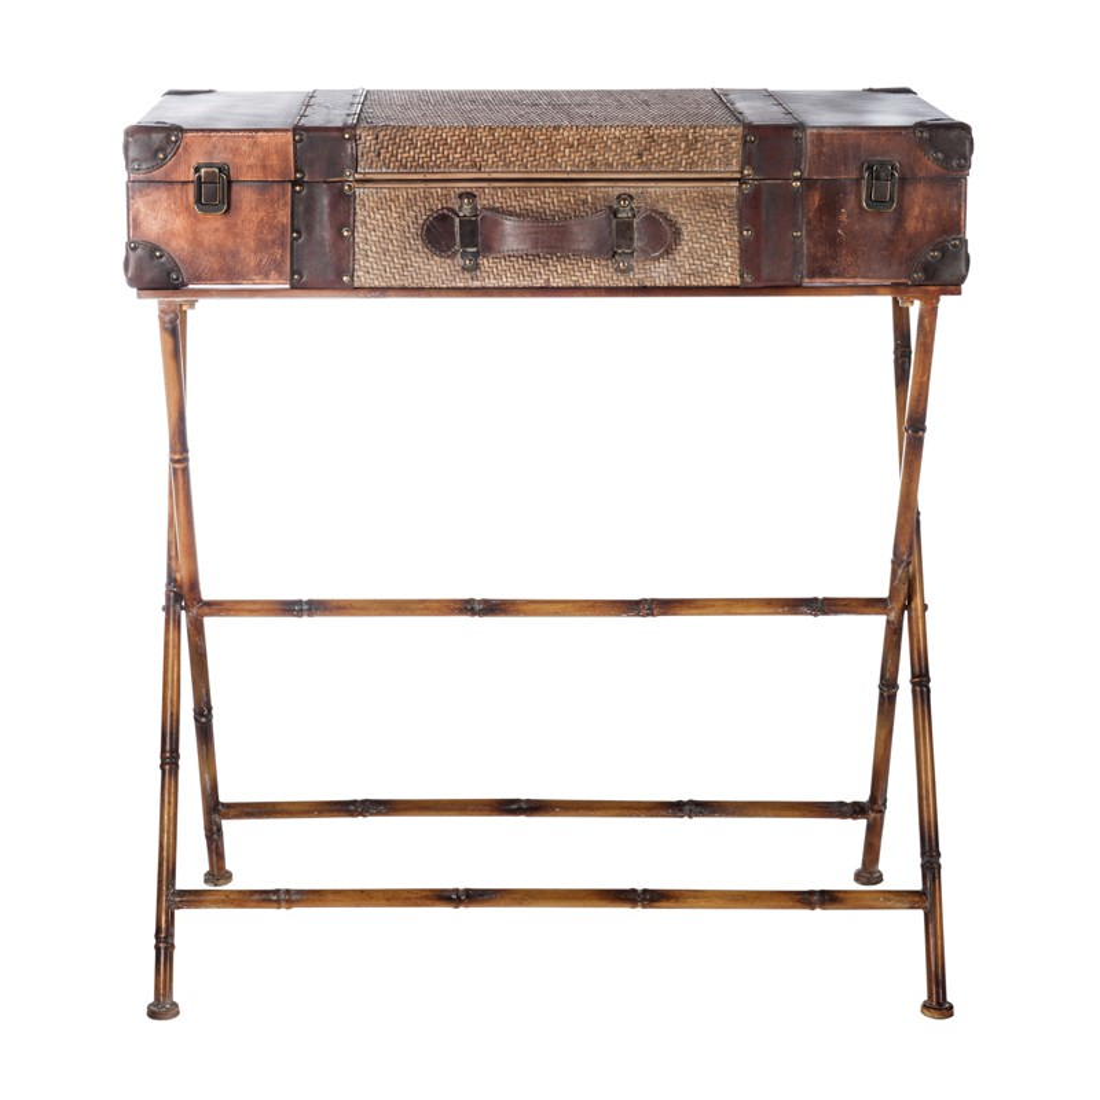 console valise m tal aspect rotin linda univers des petits meubles. Black Bedroom Furniture Sets. Home Design Ideas